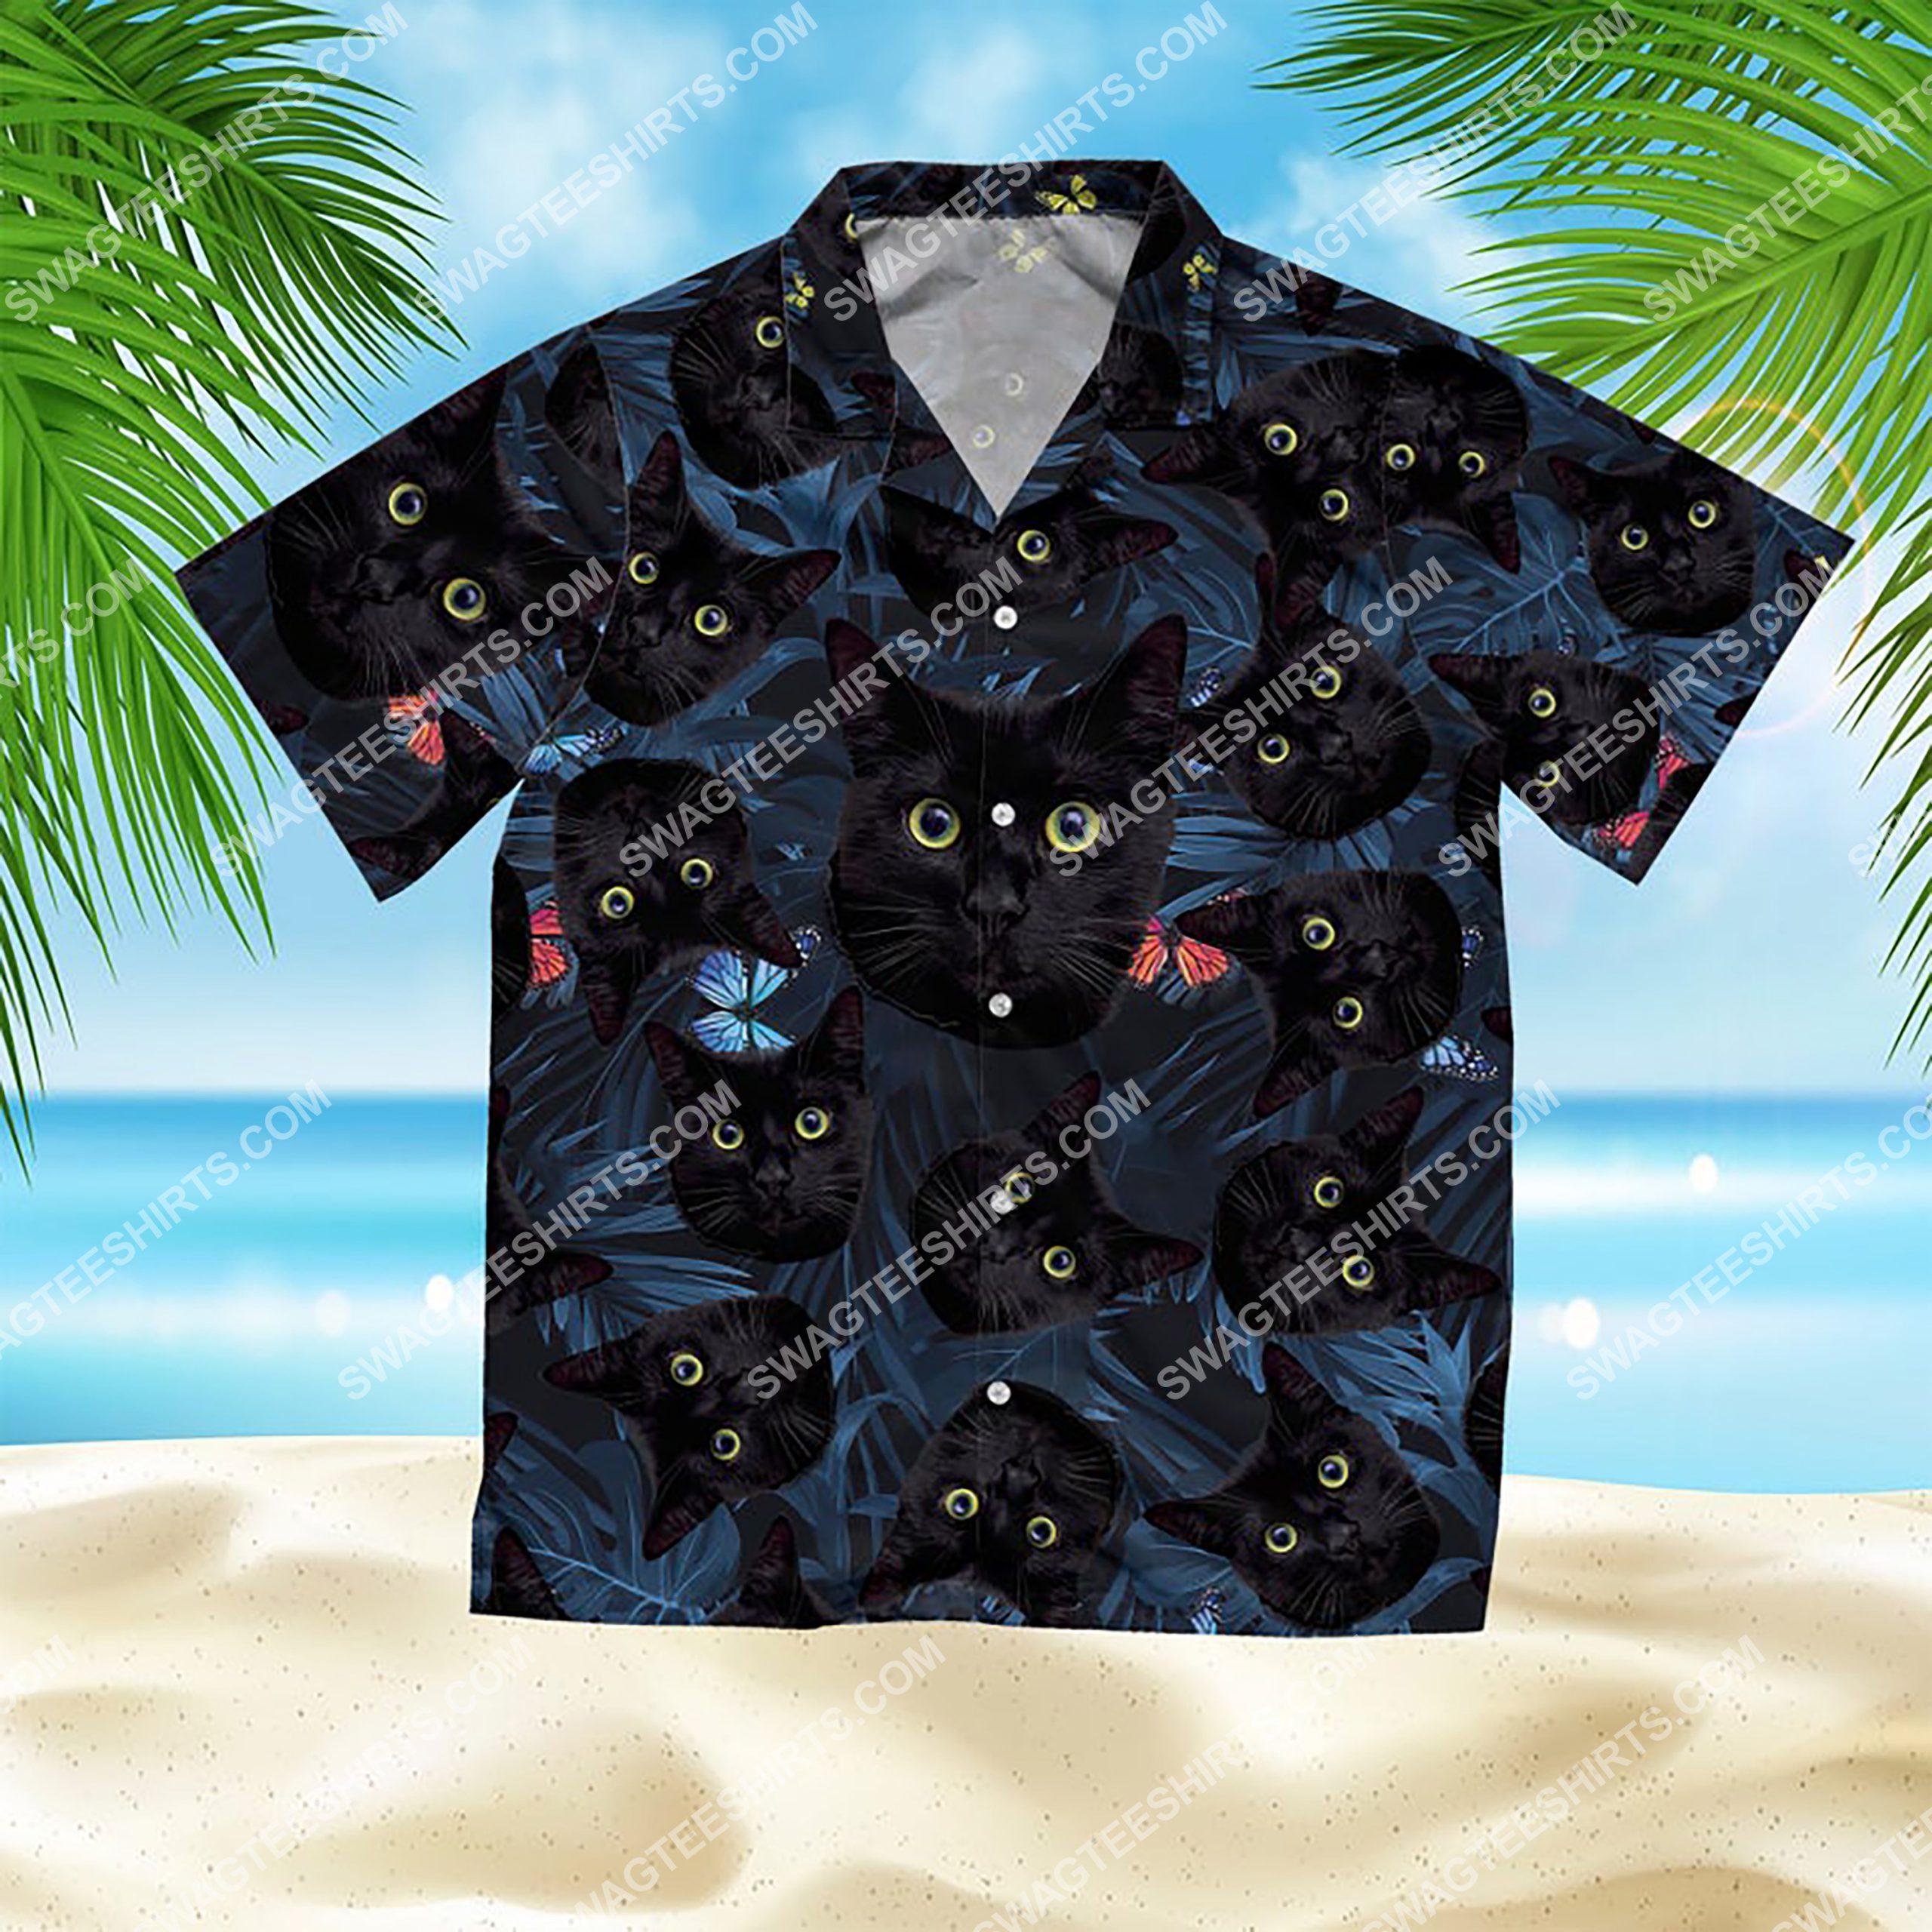 summer time tropical black cat all over print hawaiian shirt 2(1) - Copy